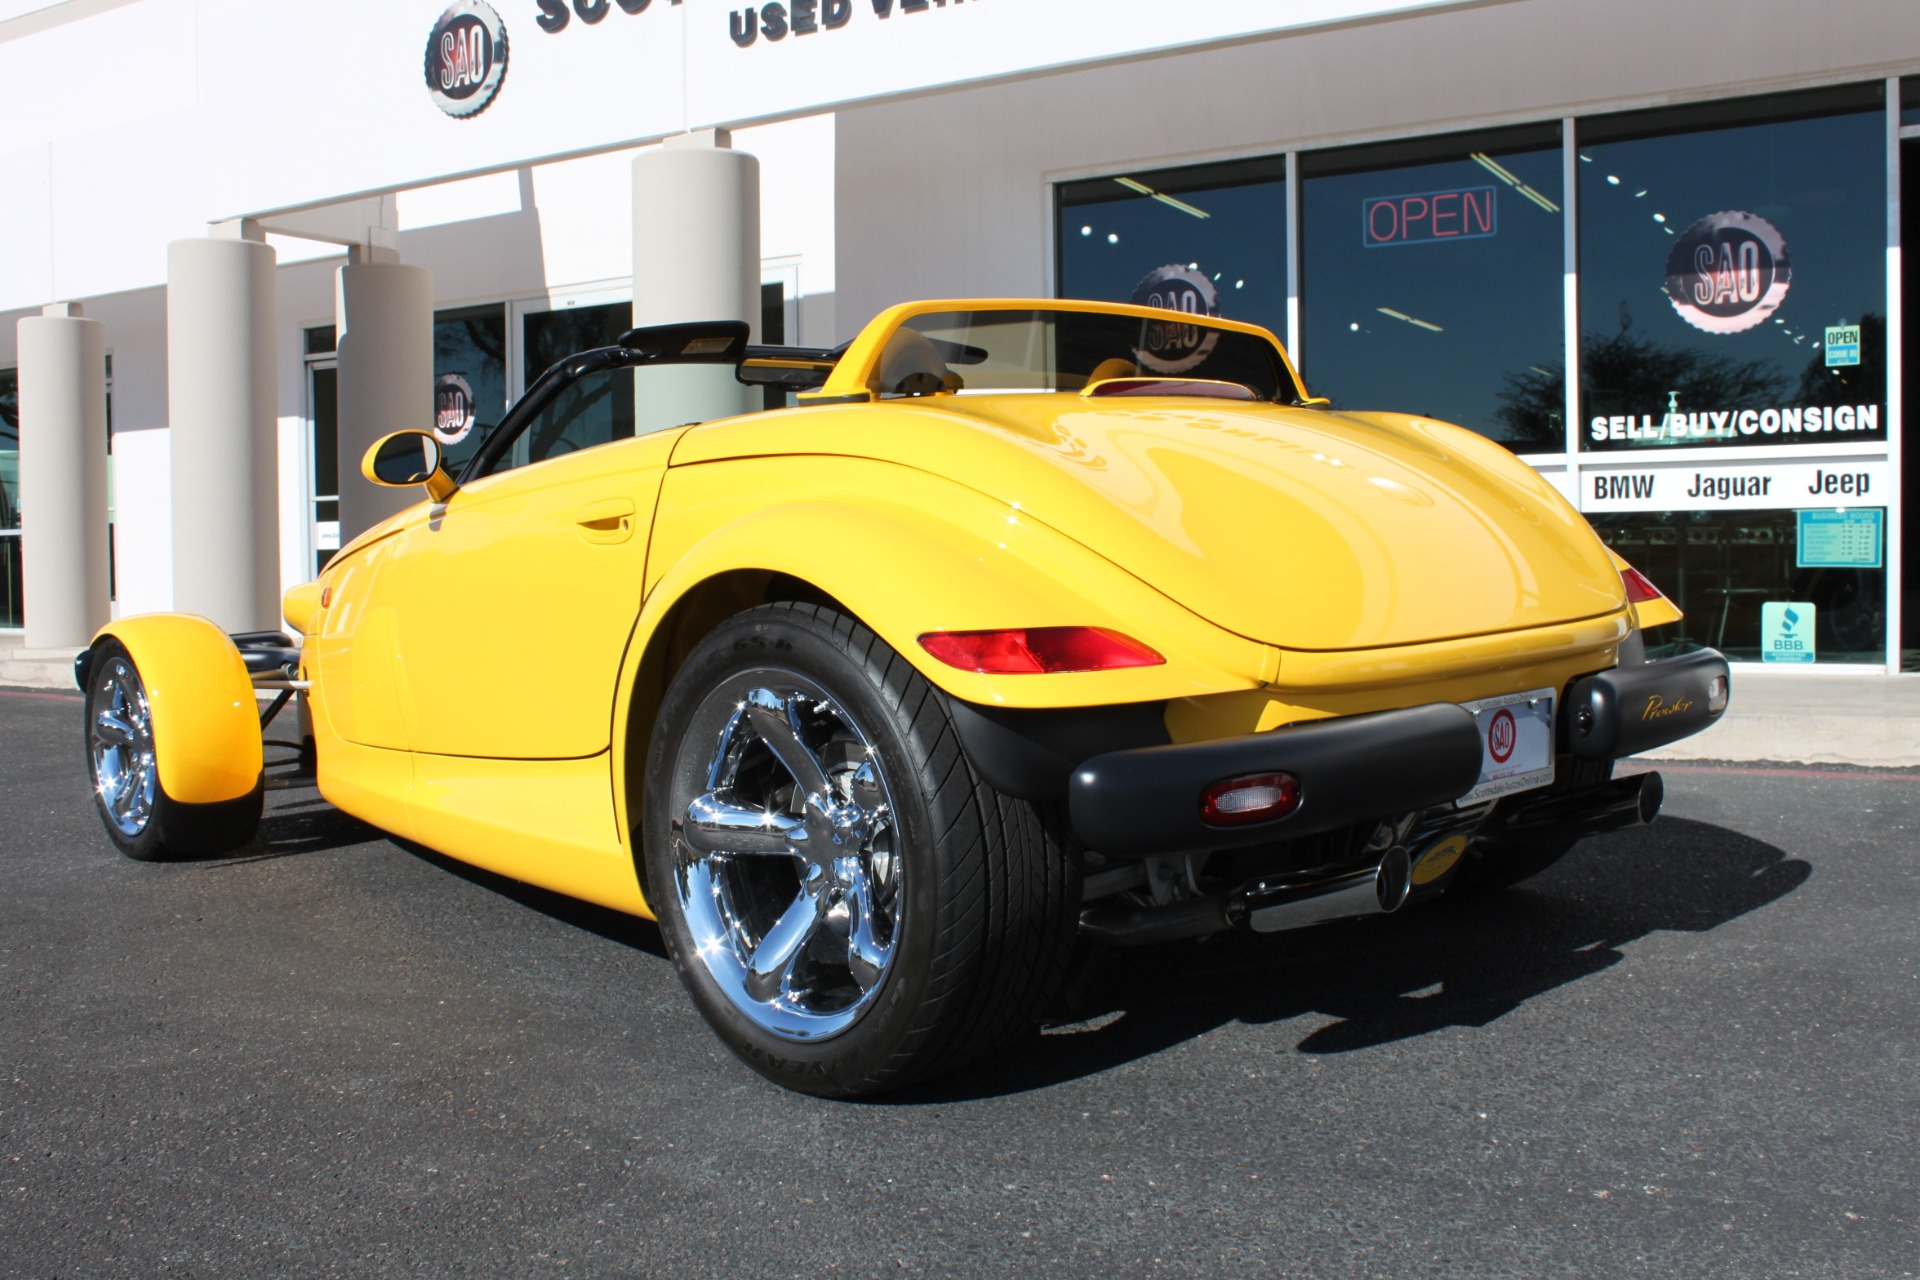 Used-2002-Chrysler-Prowler-Grand-Wagoneer